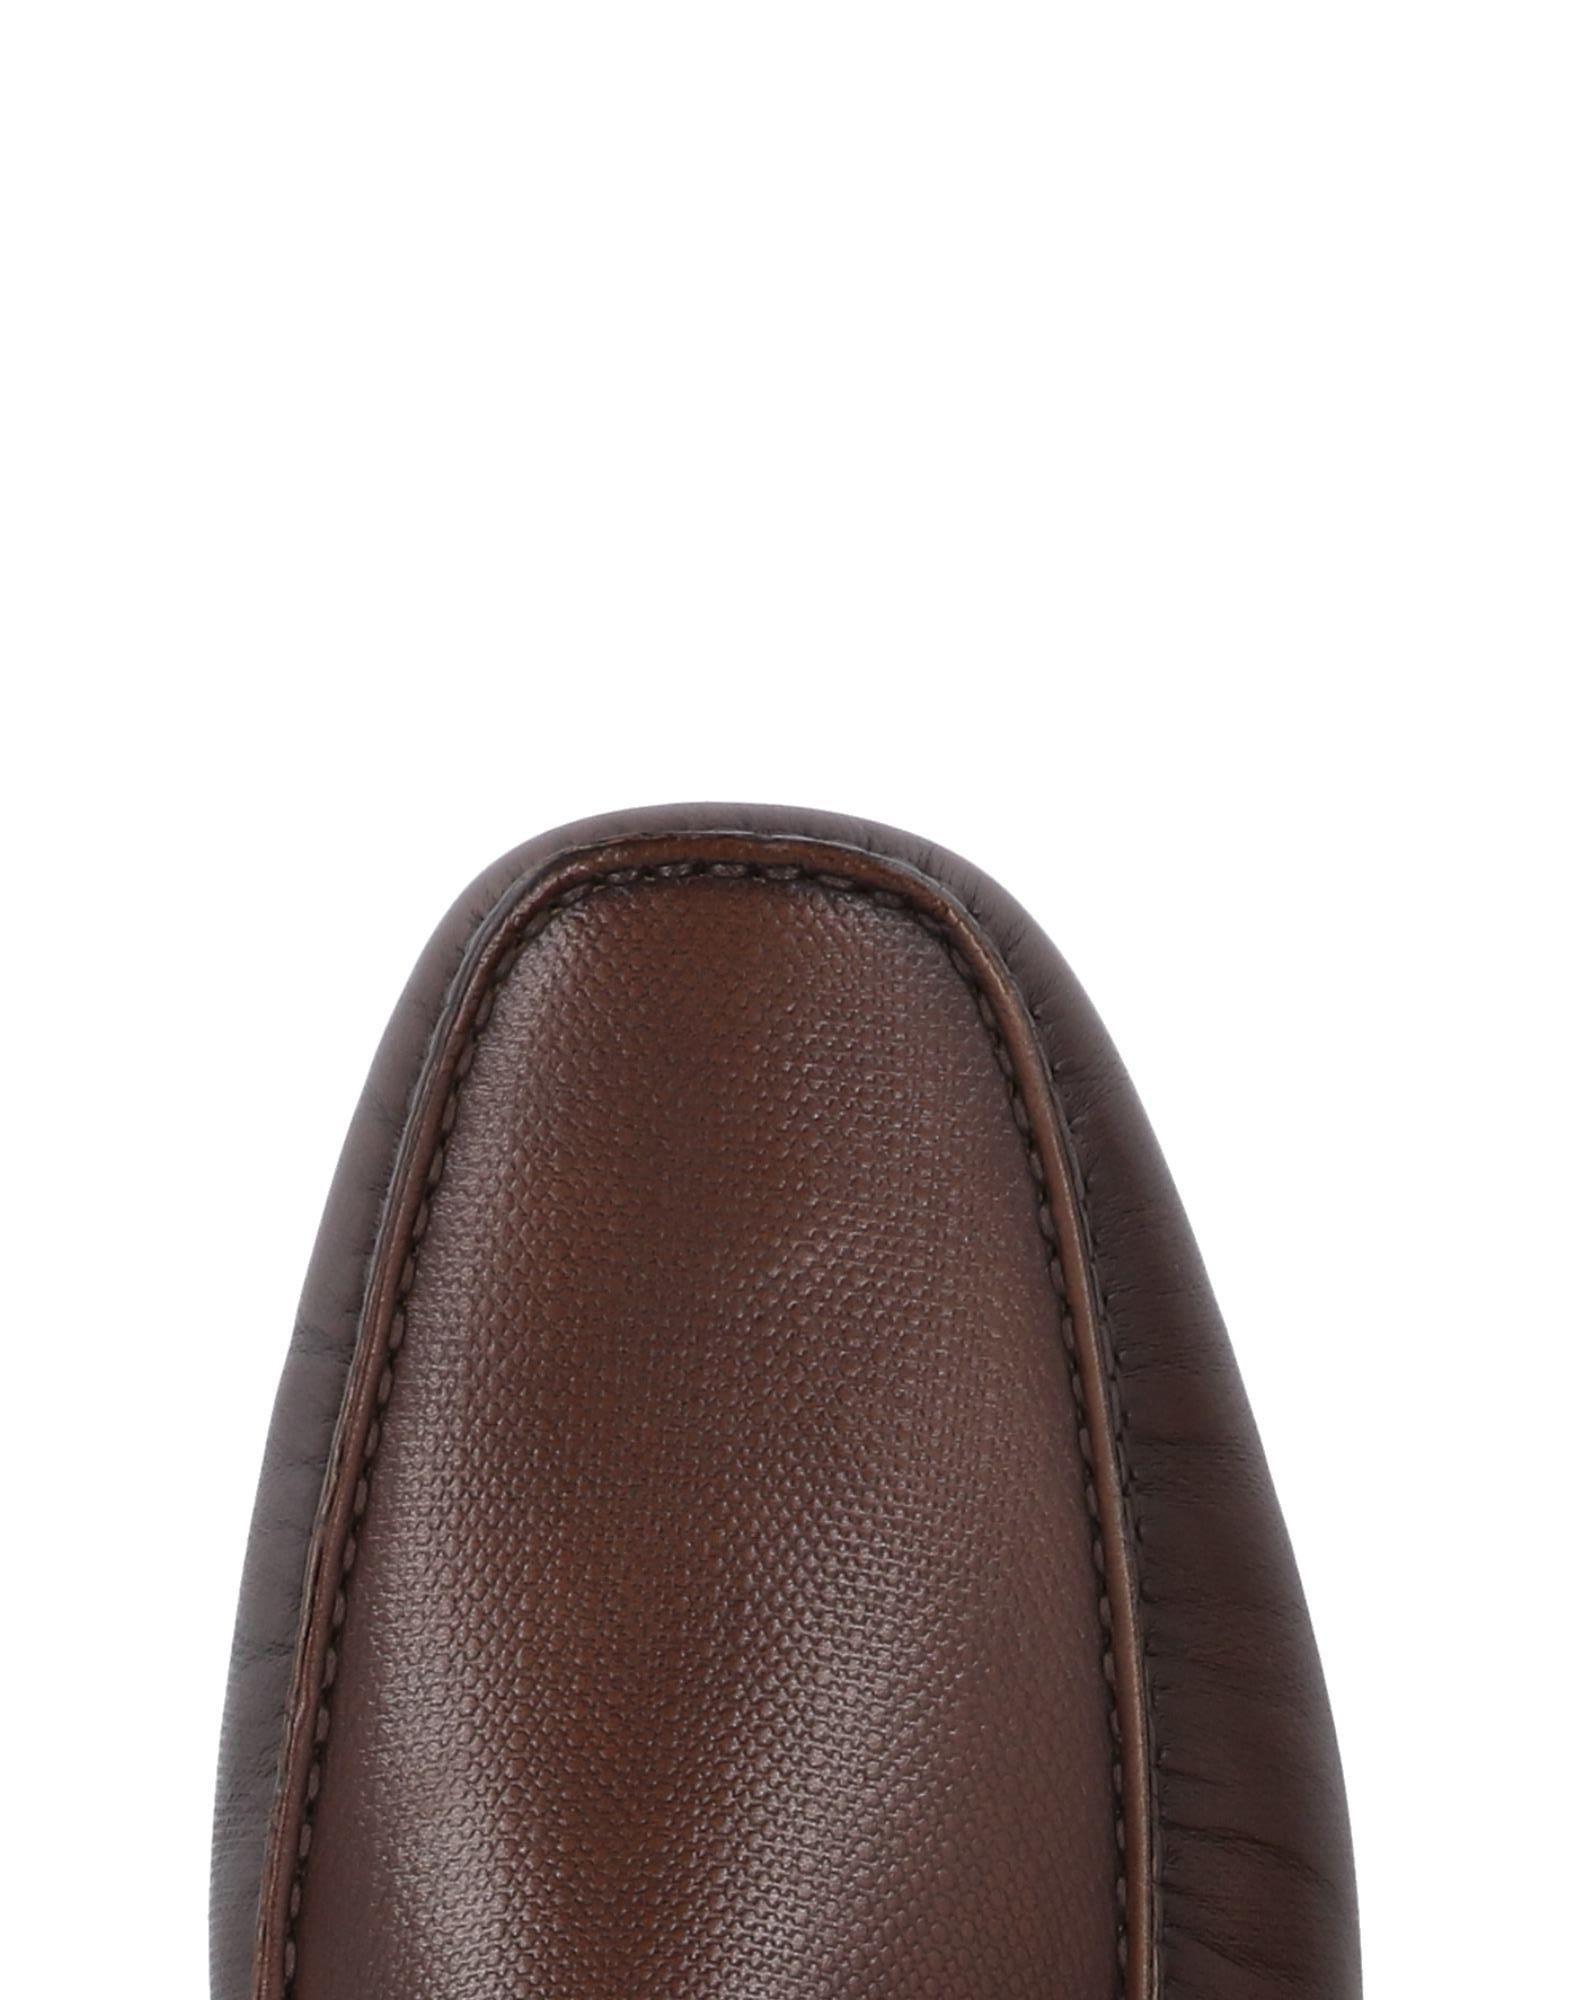 Santoni Mokassins Herren Herren Herren  11478540CB Gute Qualität beliebte Schuhe bc0f97